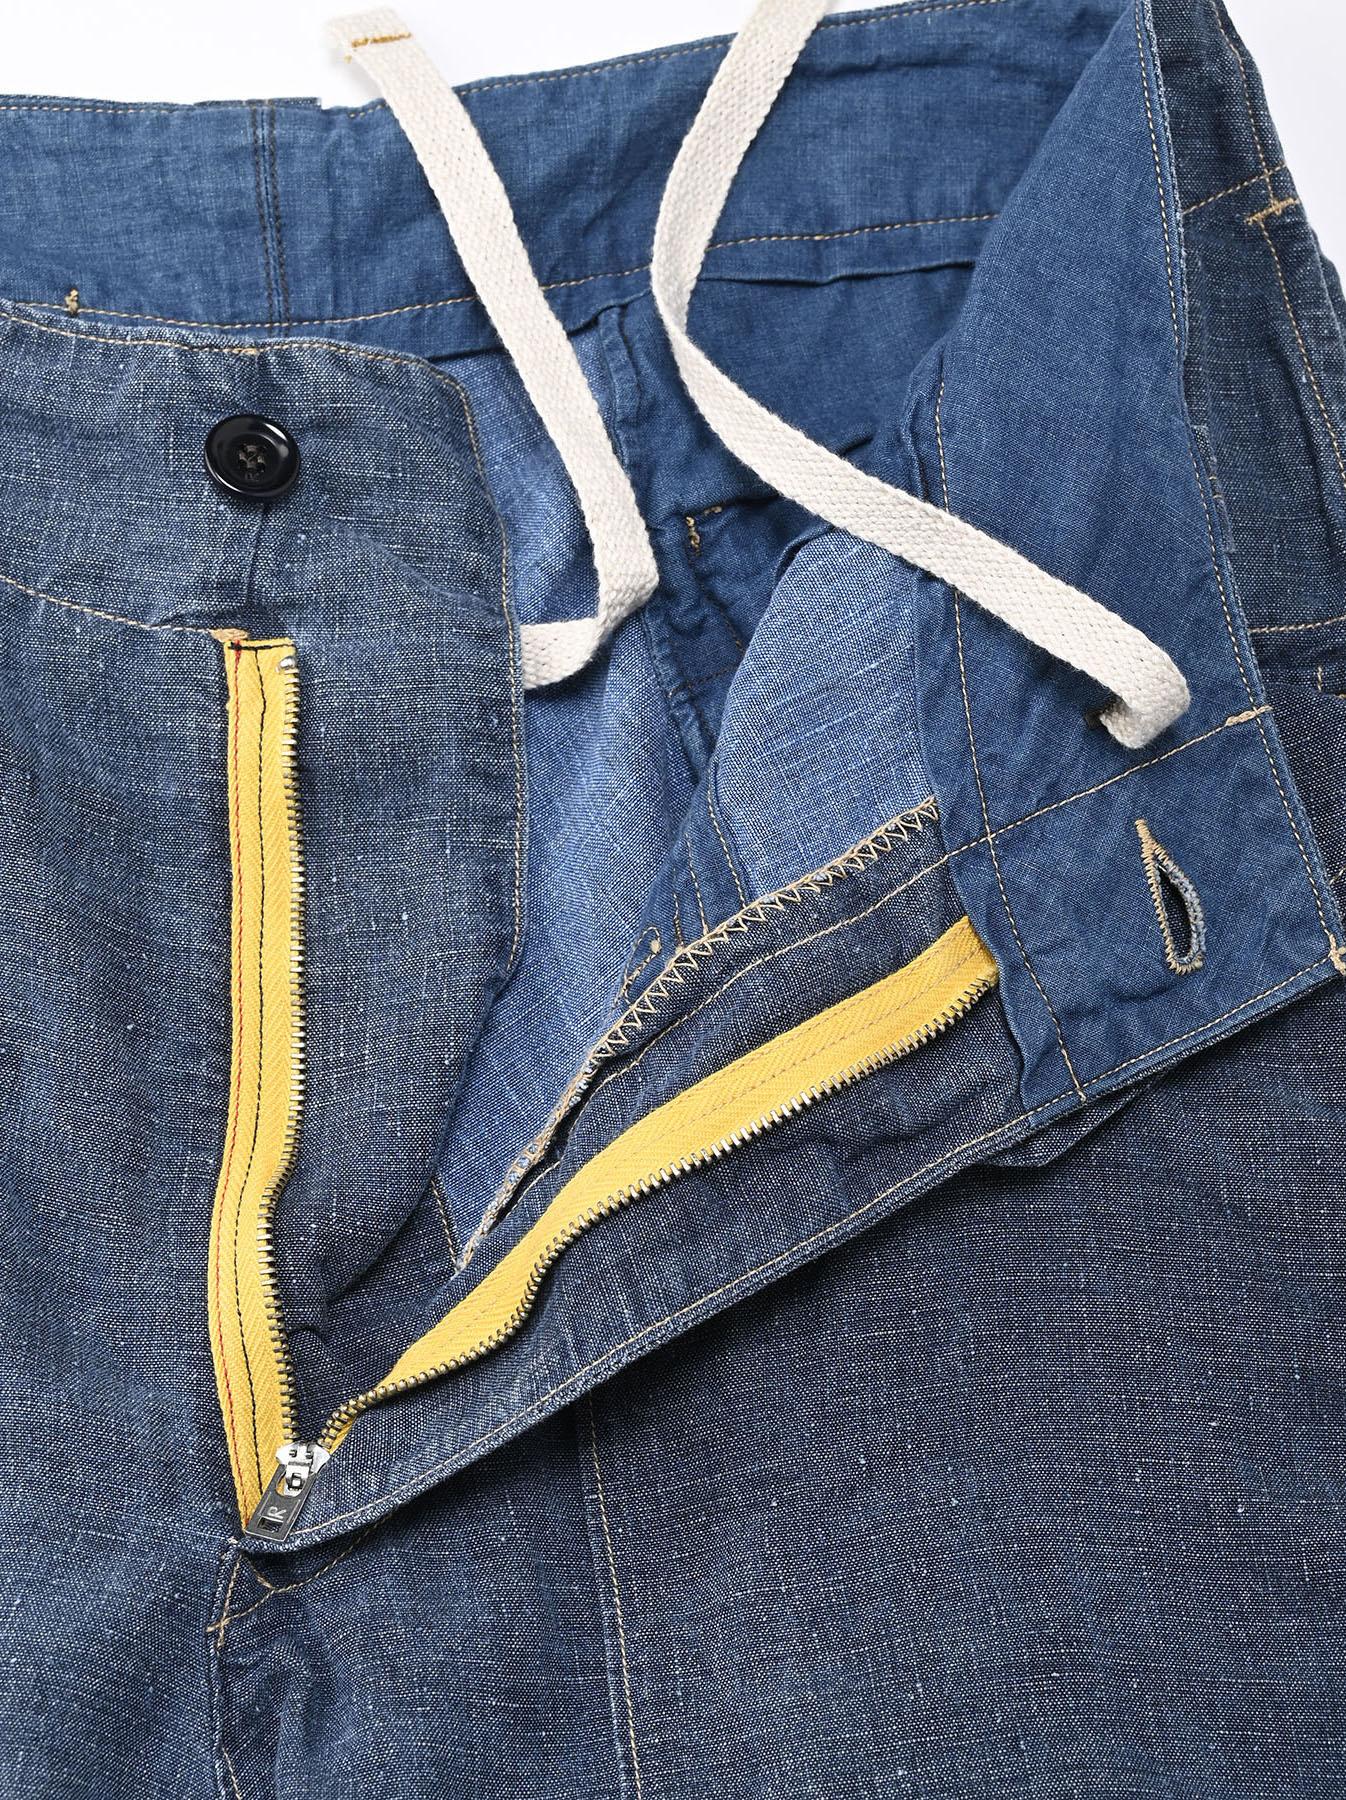 Indigo Linen 908 Easy Sail Pants Distressed (0721)-6